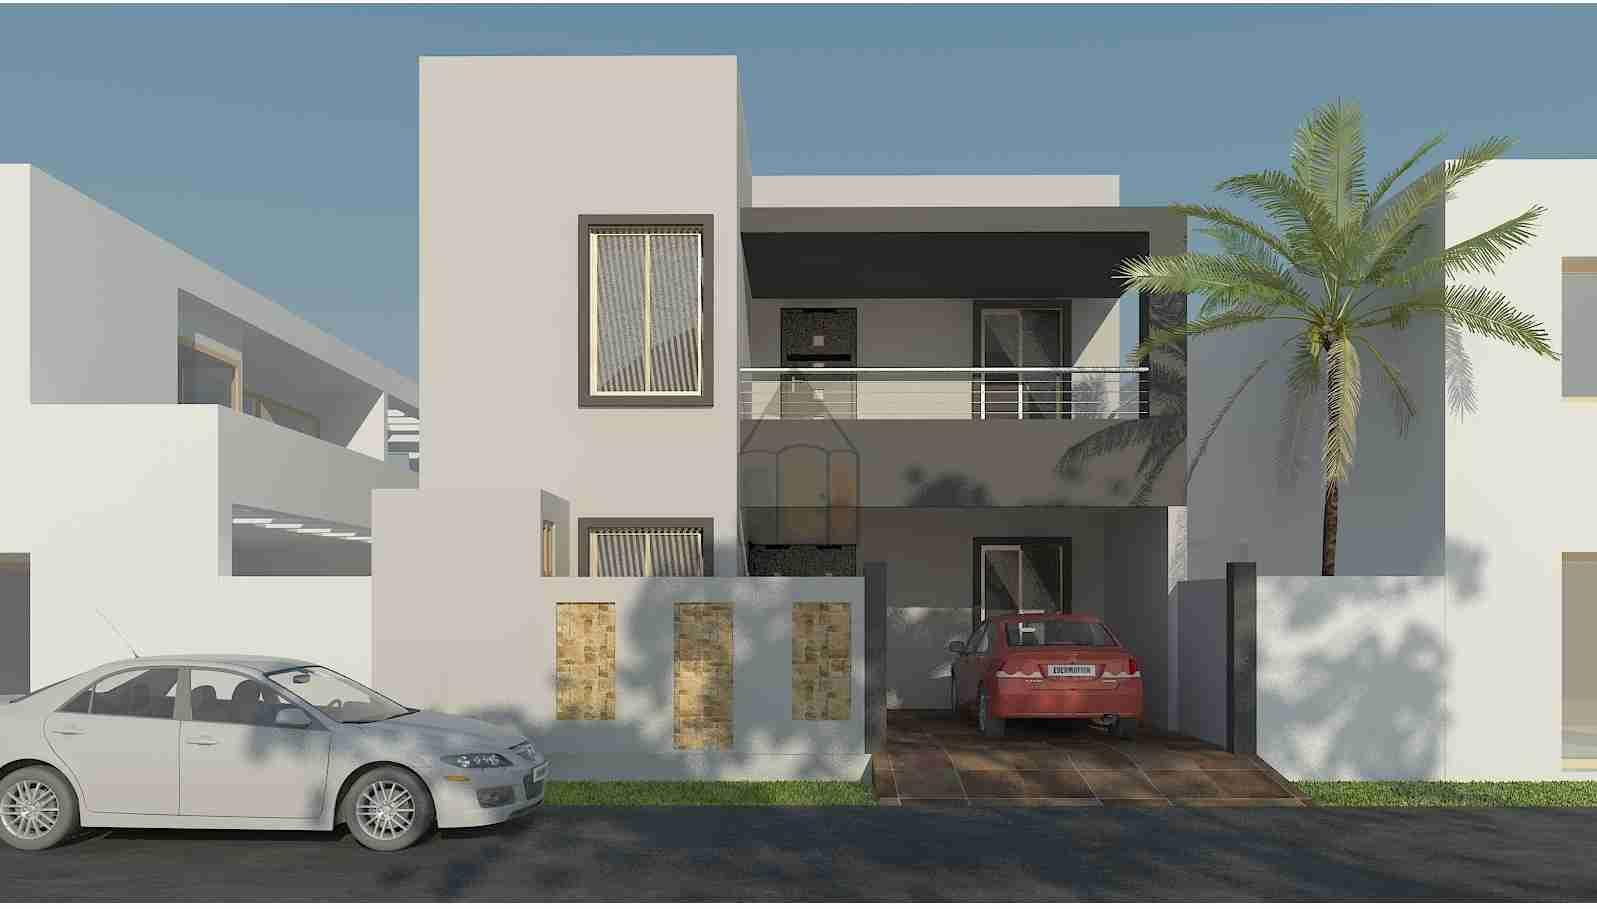 6 Marla House Plan Design 3d Elevation House Front Design Home Design Plans Beautiful House Plans